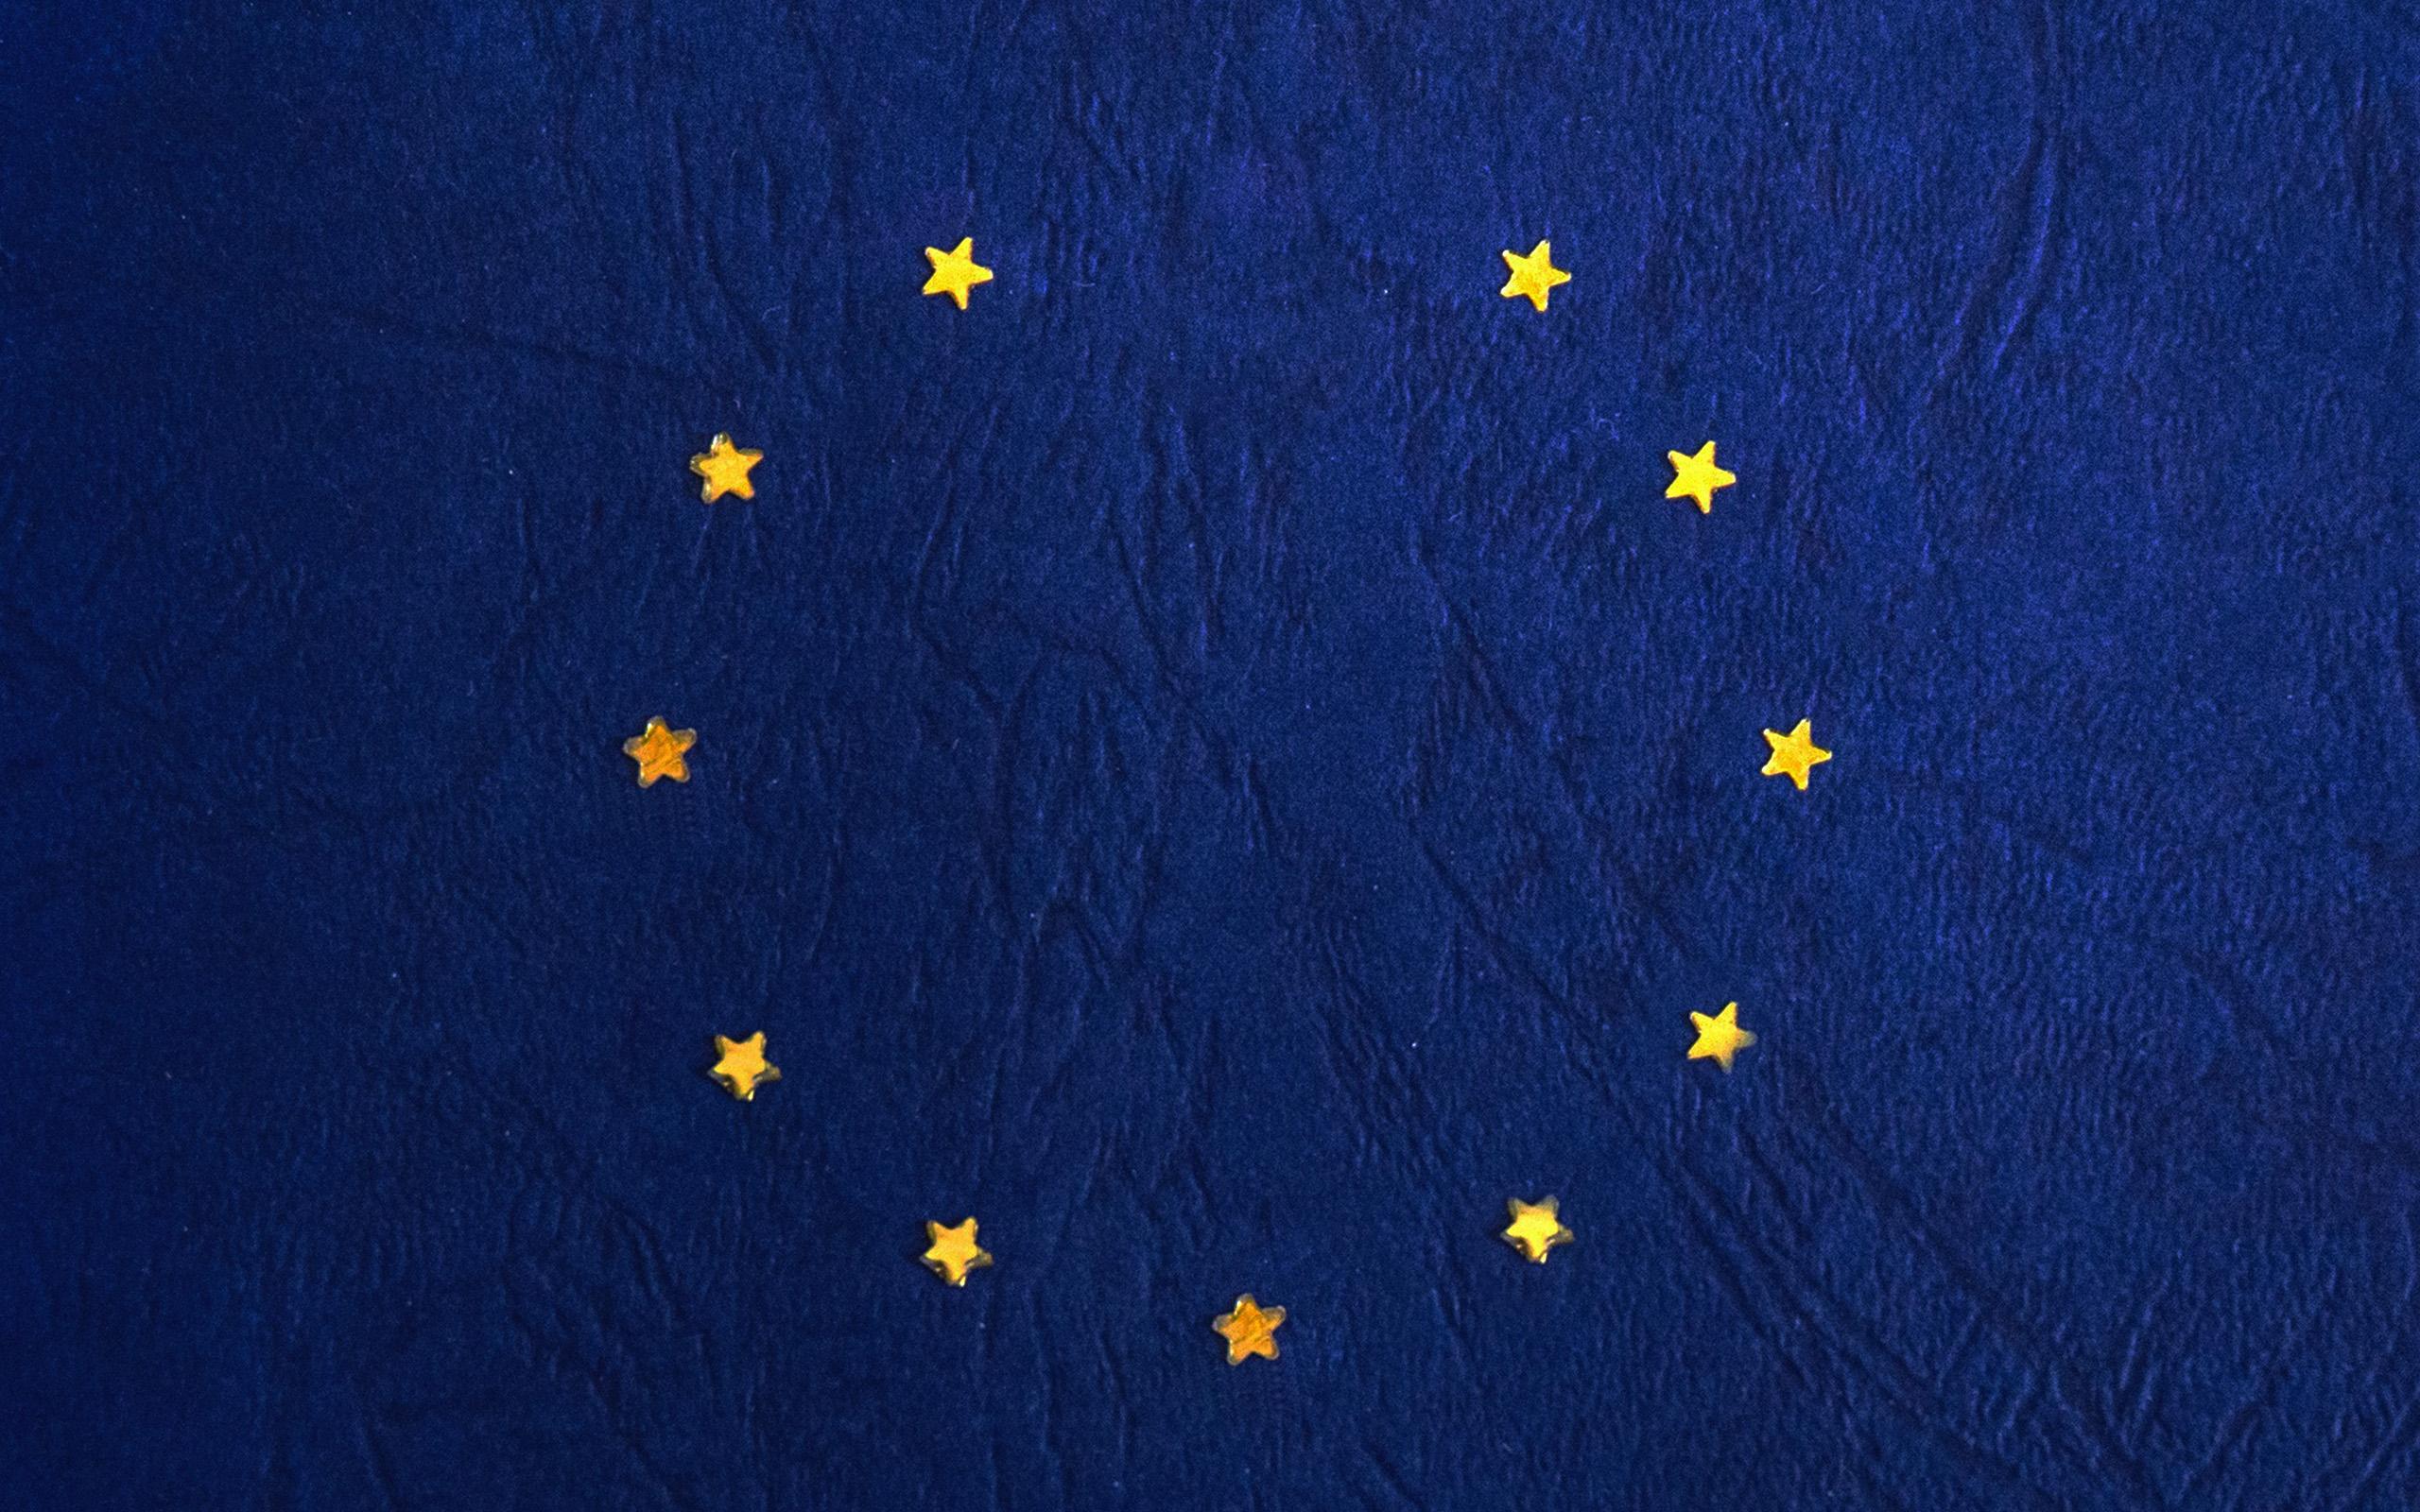 As02-brexit-euro-cool-nice-art-illustration-wallpaper